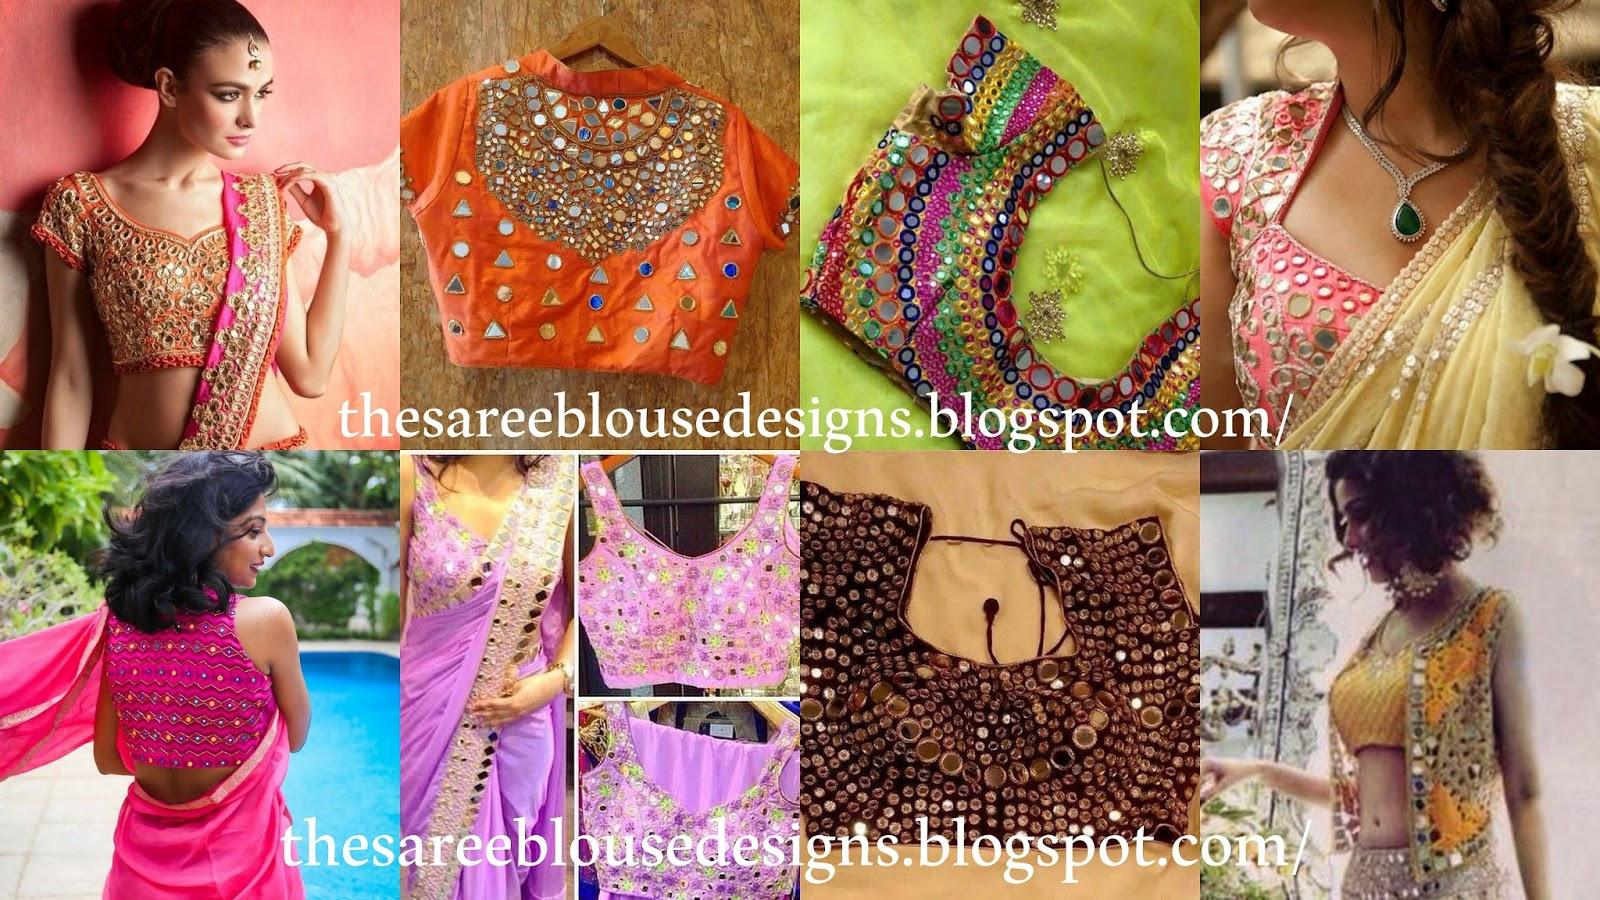 Saree Blouse Designs: Types of Blouse